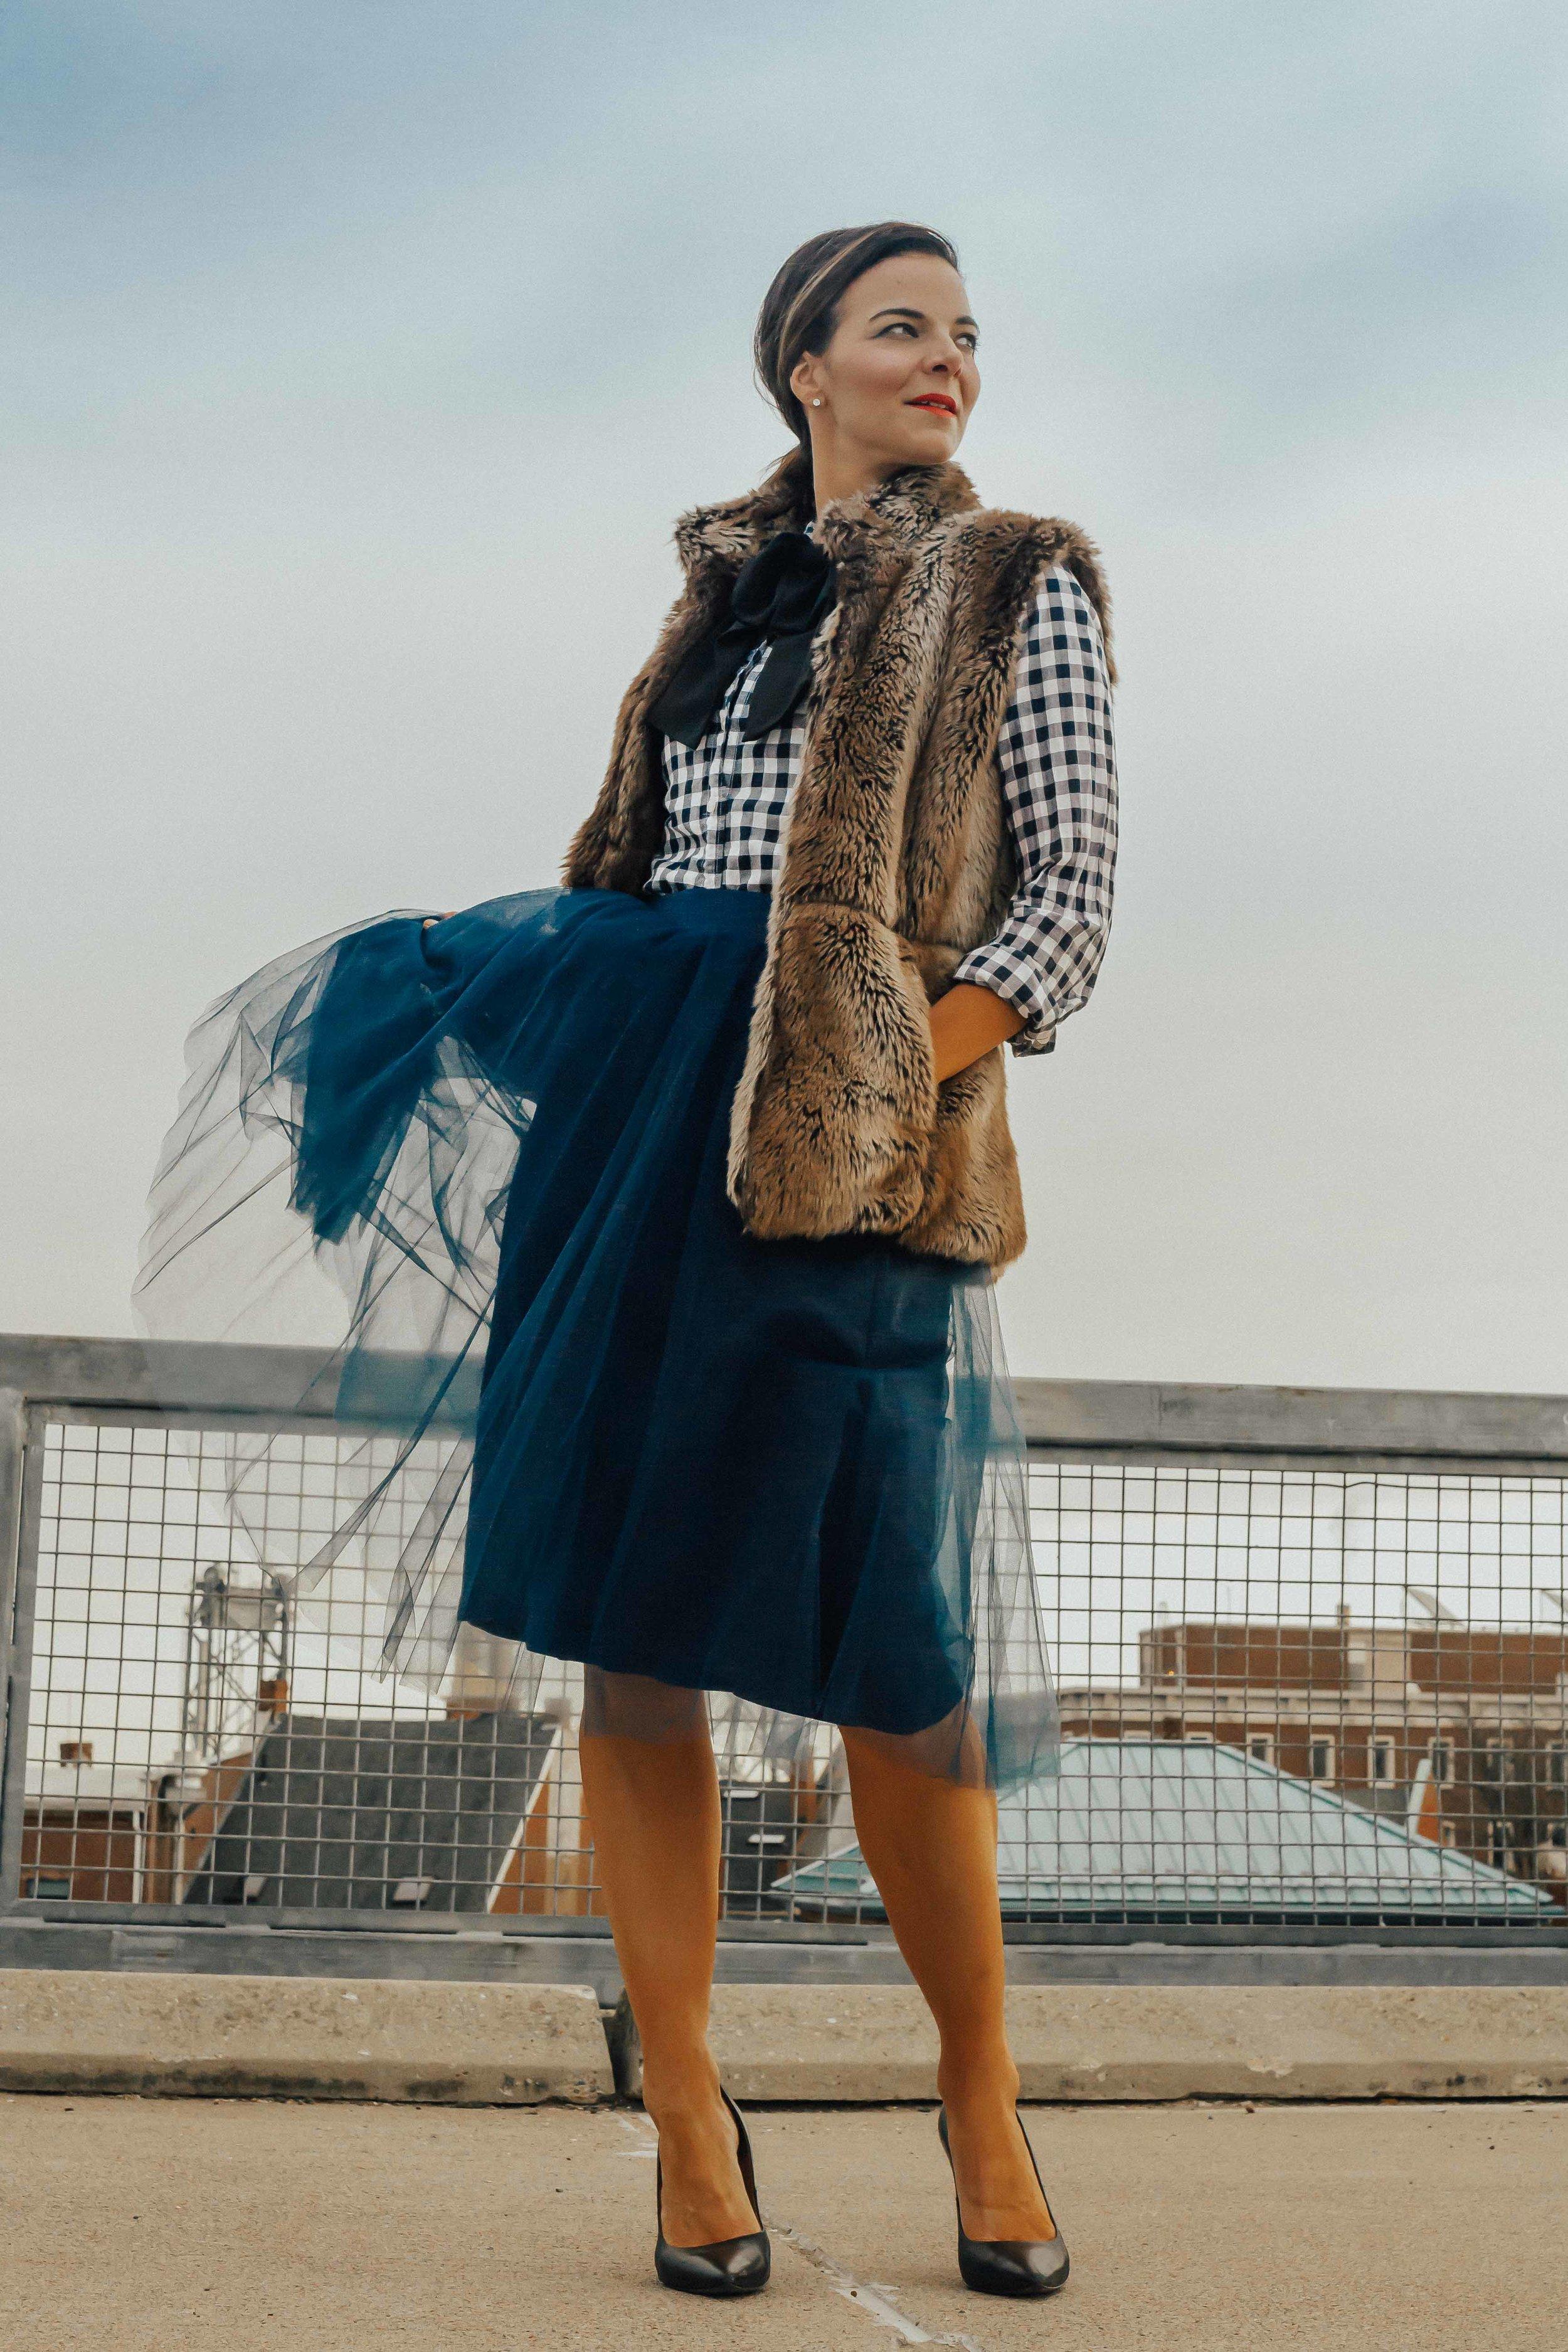 Blue Tulle Skirt Oufits – Tulle Skirt – Tulle Skirt Oufit – Gingham Shirt and Tulle Skirt Outfits- Holiday Outfit Ideas for Women- Faux Fur Vest Outfits for Women – Gingham Shirt Outifts - Tulle Skirts – Bowtie Outfits for Women #tulleskirts #gingham #tulle #bowite #heartandseam  www.heartandseam.com